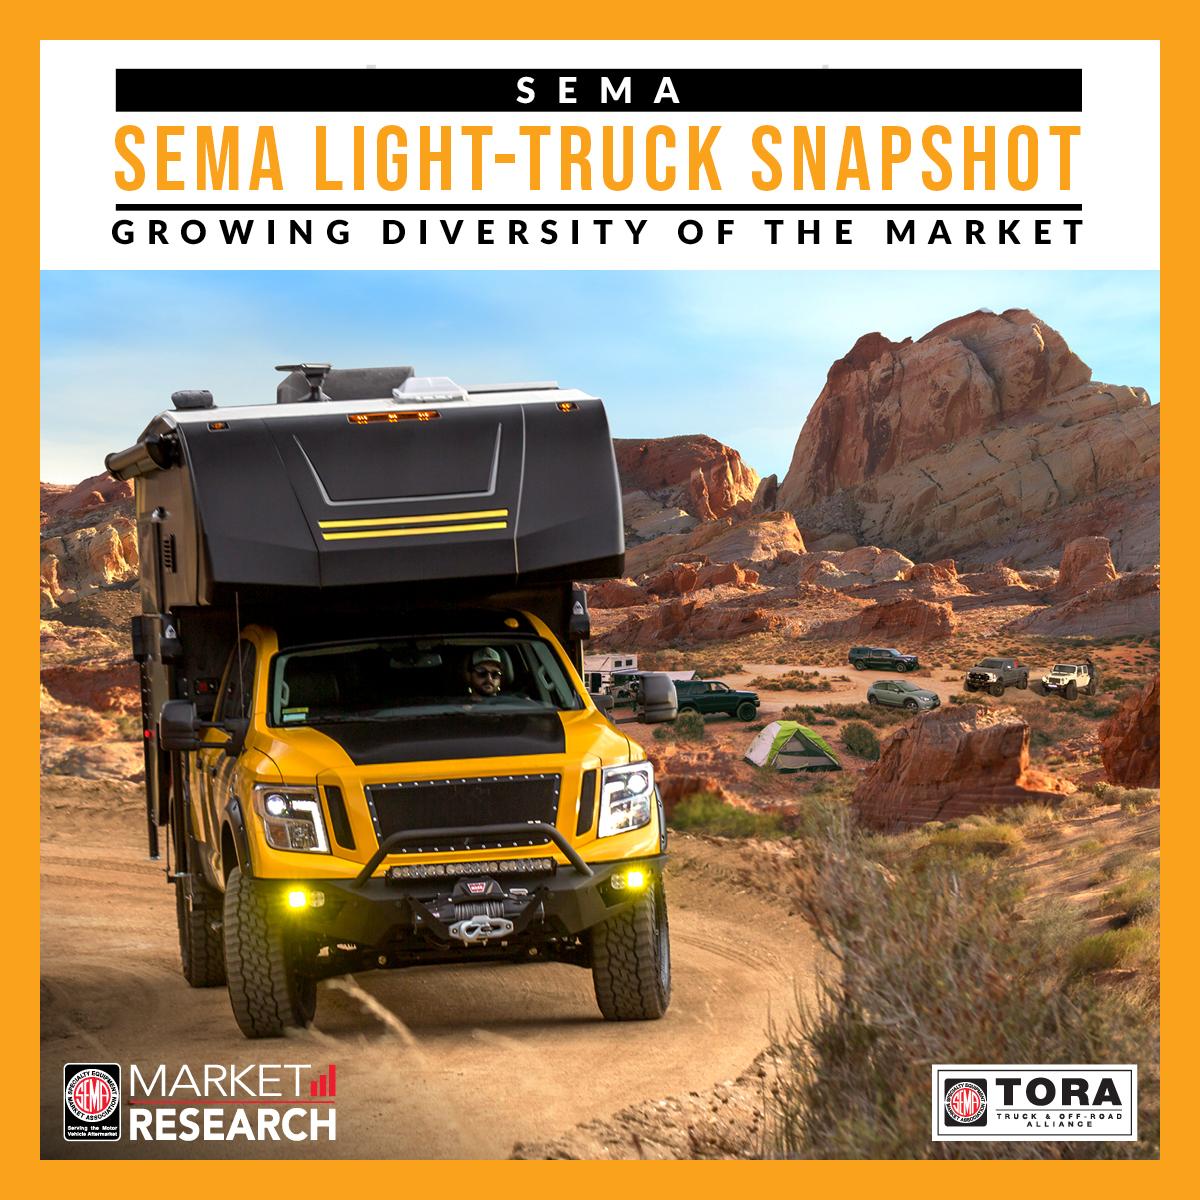 210517 SEMA's new Light-Truck Market Snapshot report